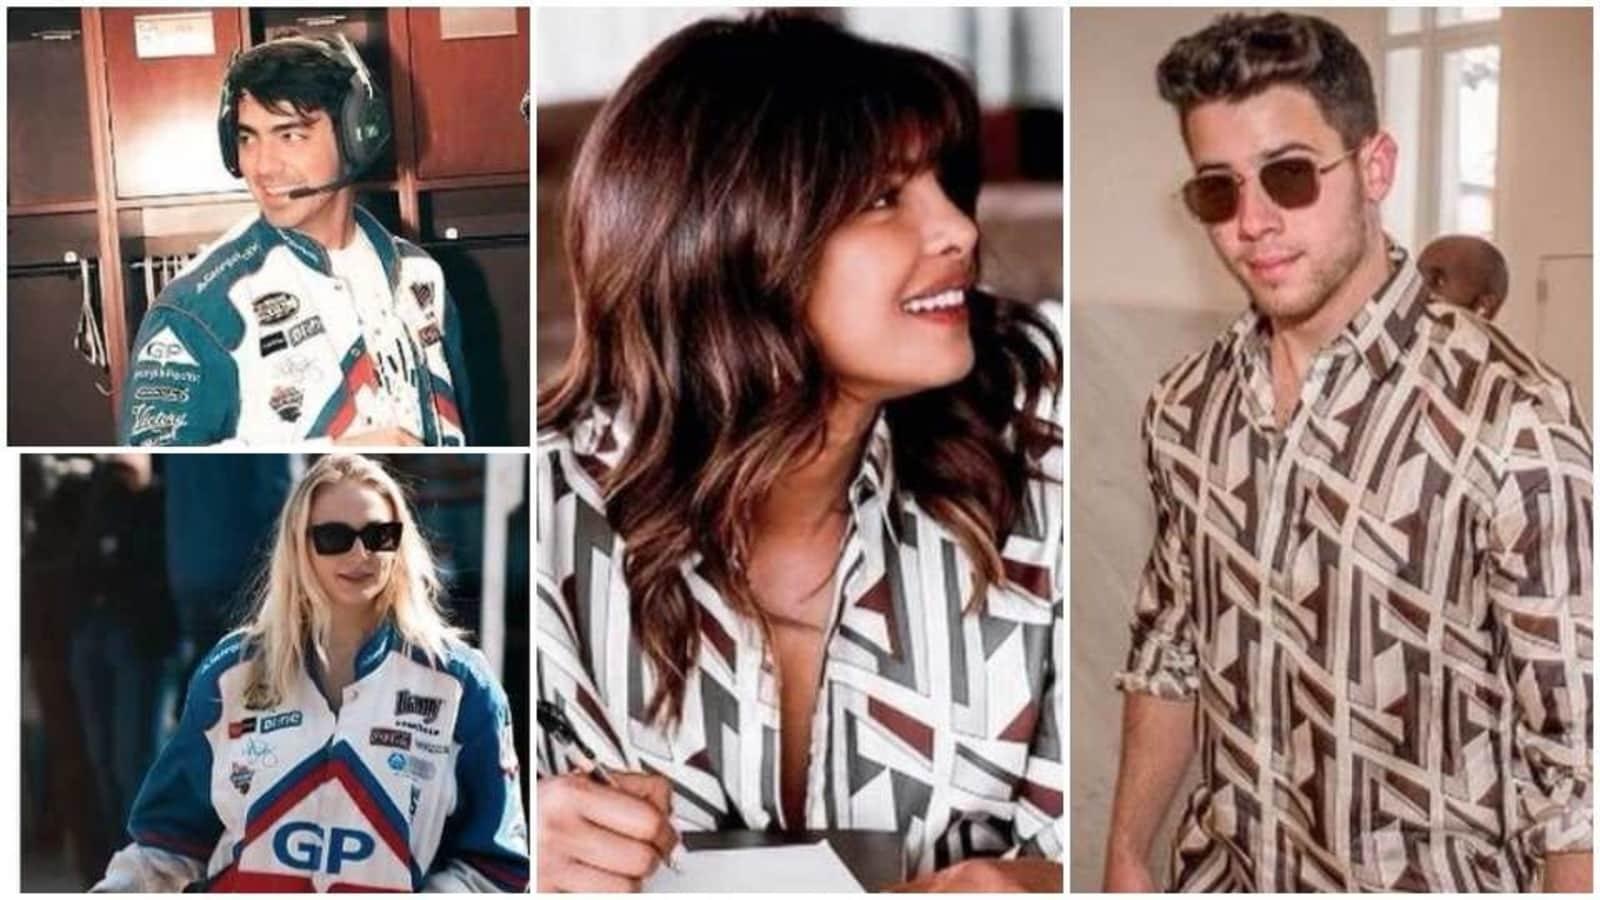 Priyanka Chopra, Sophie Turner love wearing their husbands Nick Jonas and Joe Jonas' outfits. These pics are proof - Hindustan Times